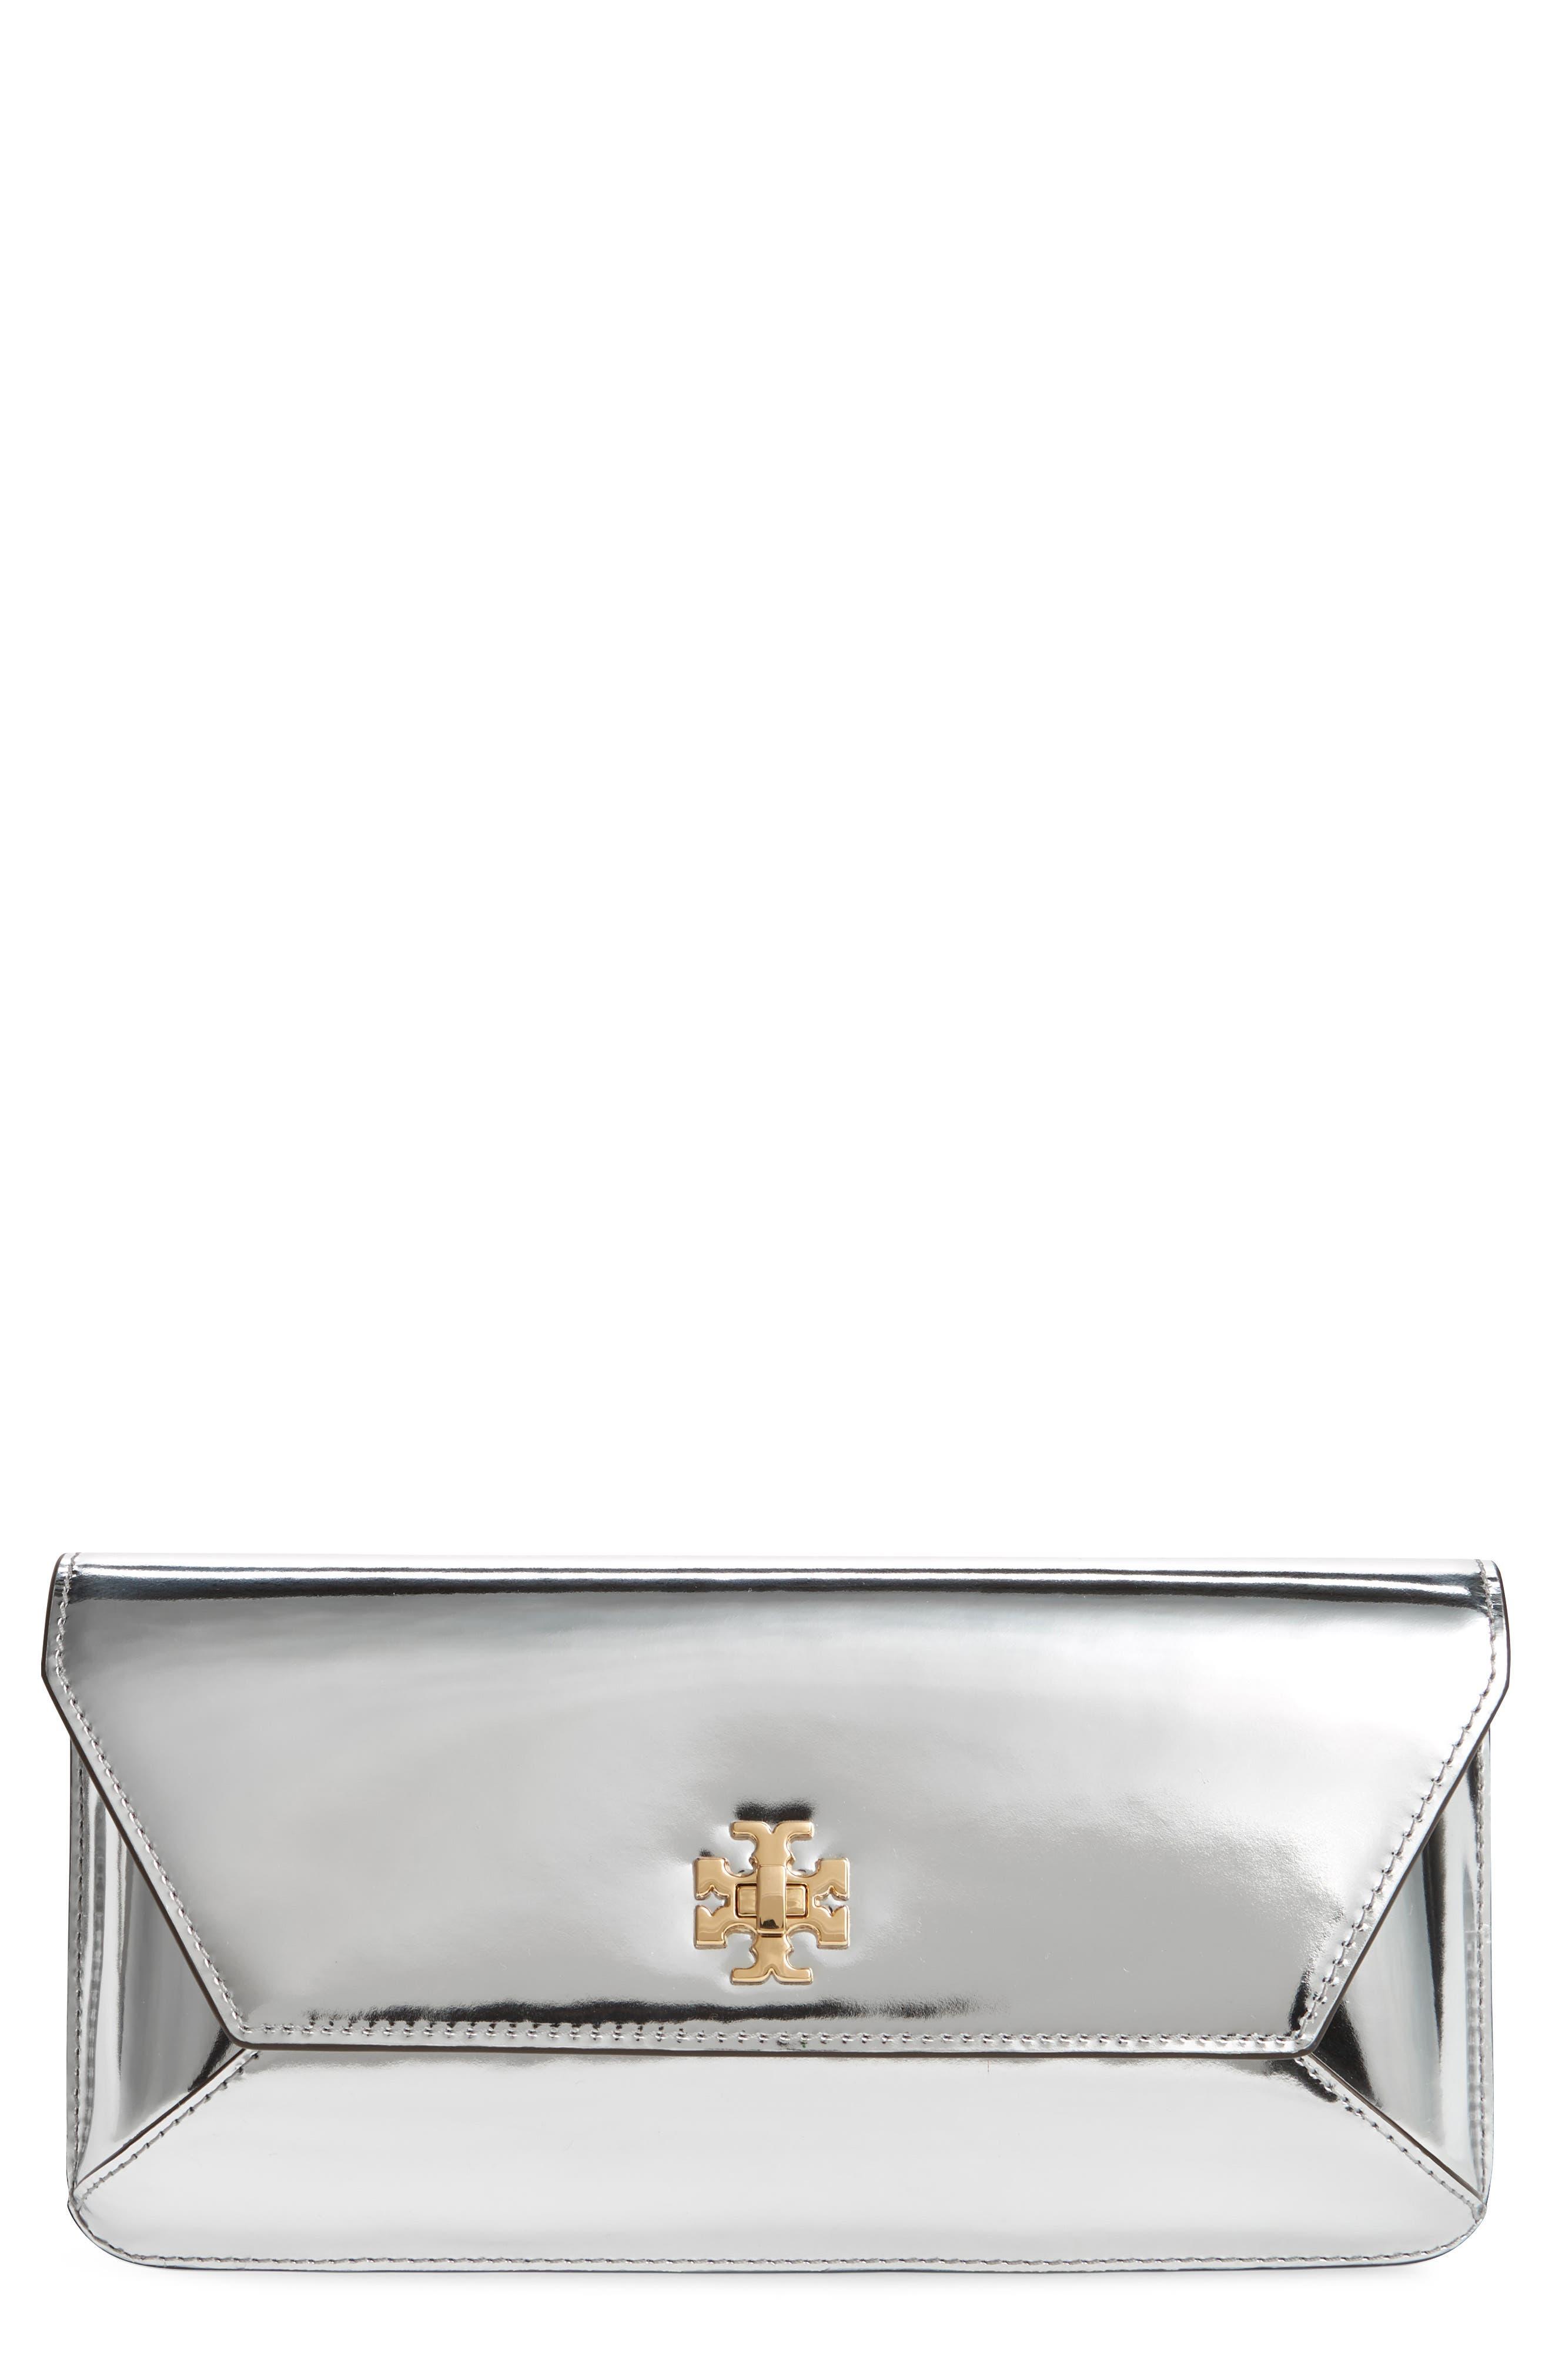 Kira Leather Envelope Clutch,                         Main,                         color, MIRROR METALLIC SILVER